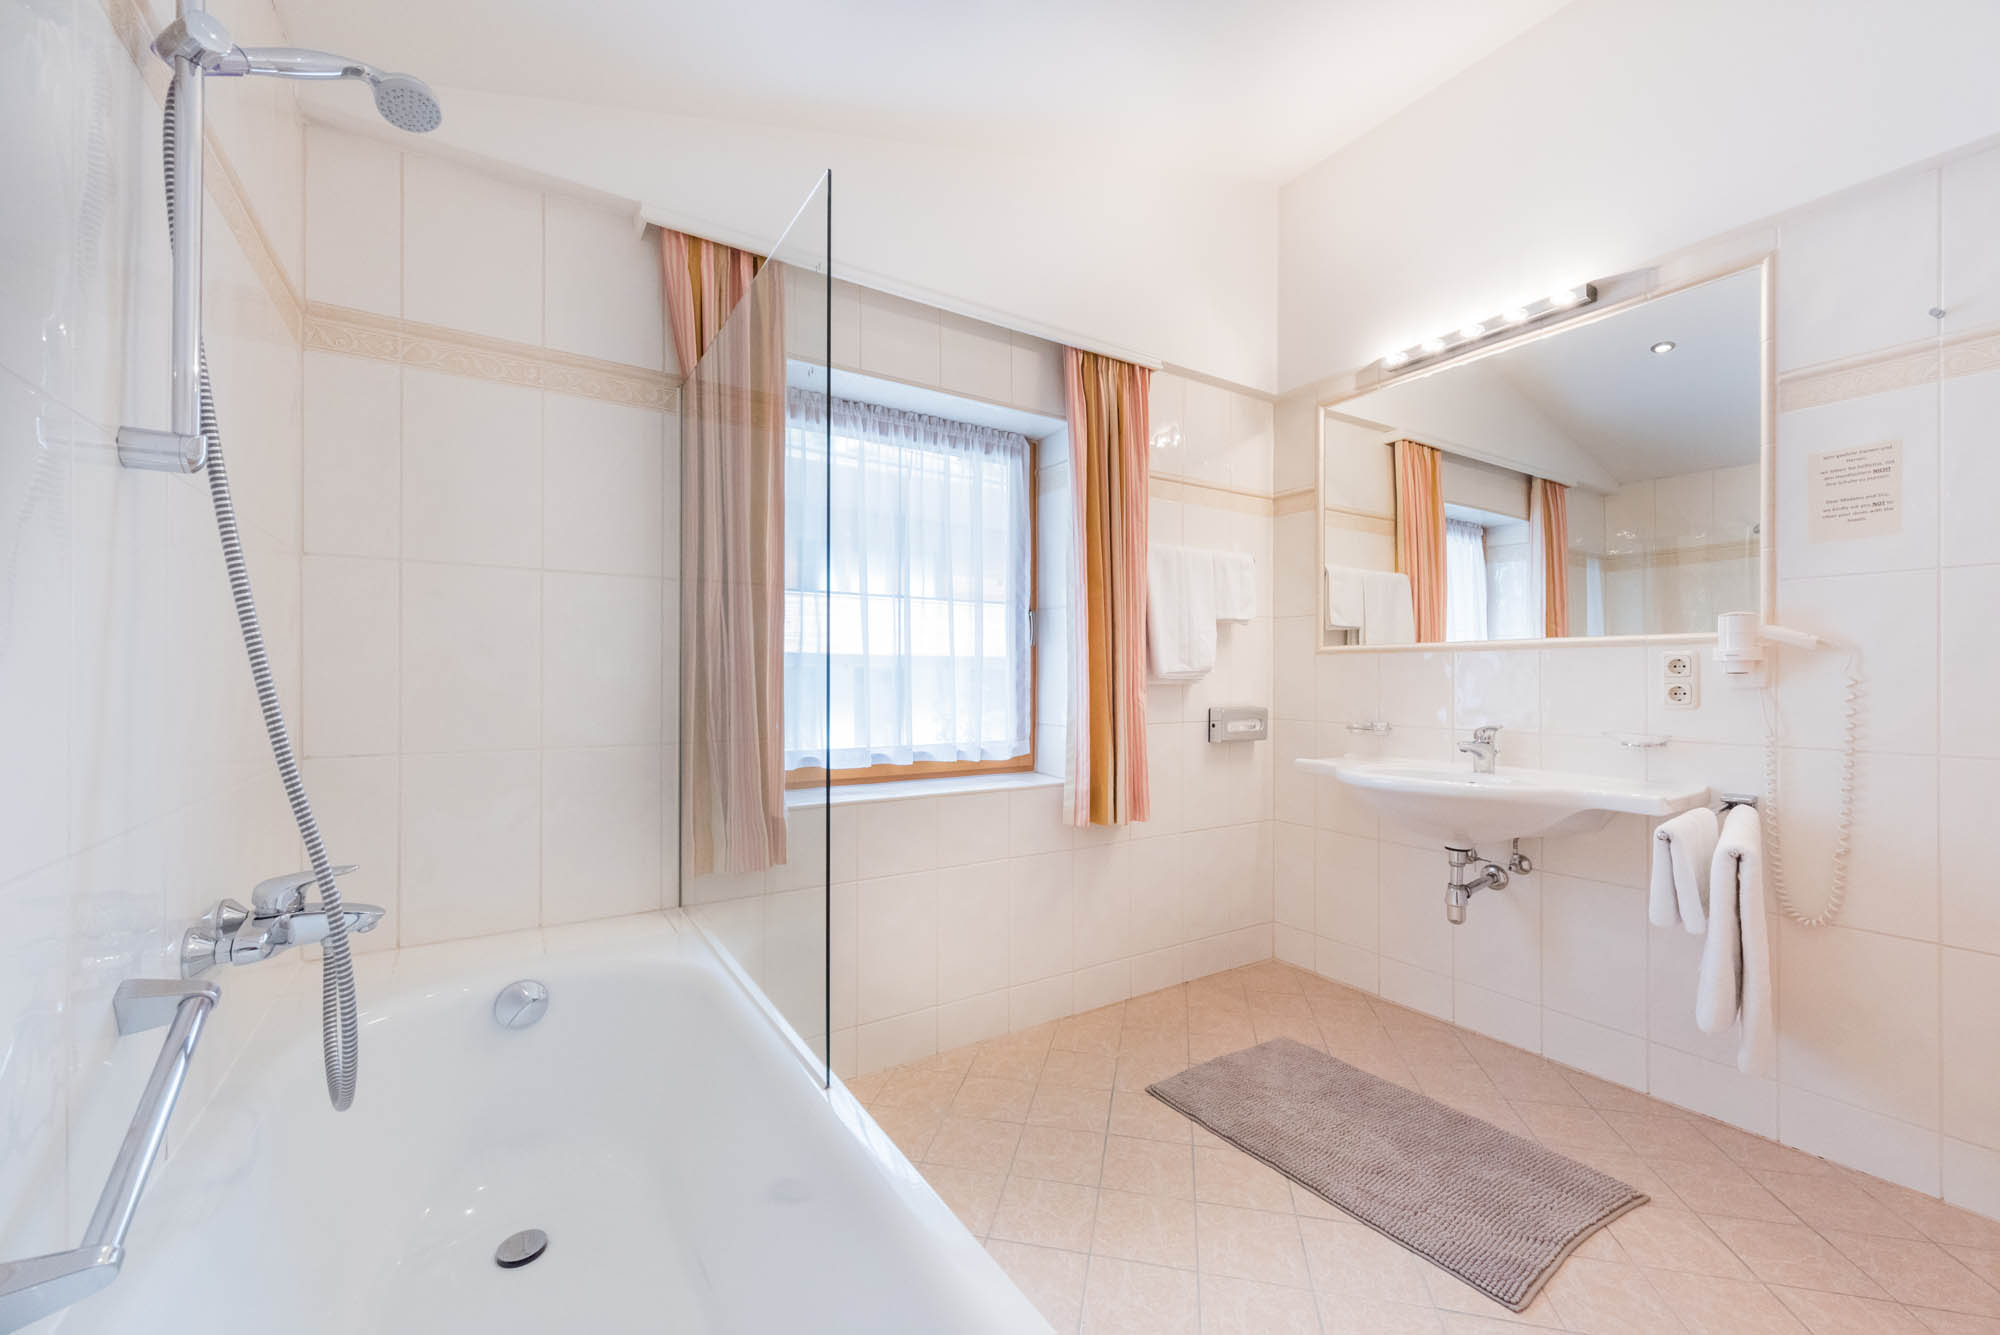 badezimmer hotel st.anton